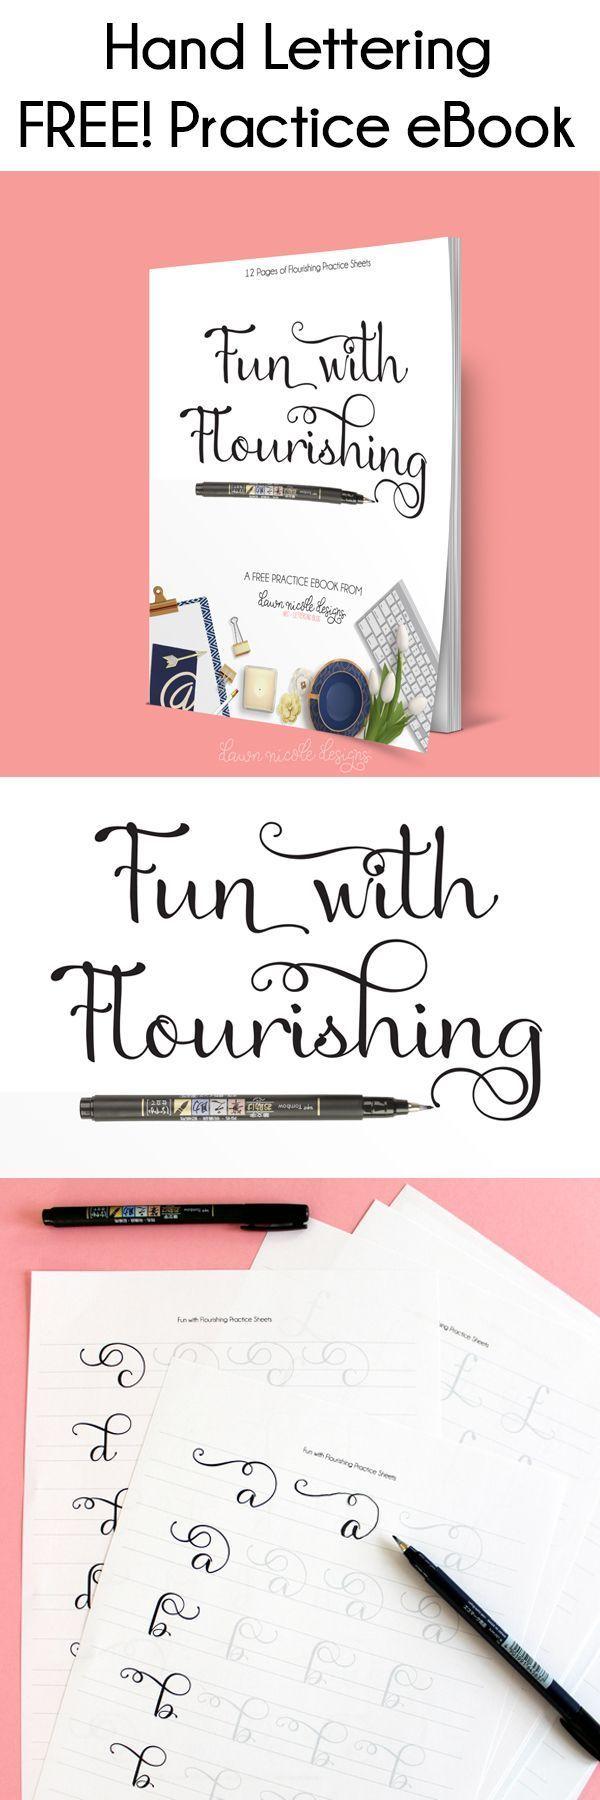 Fun With Flourishing: Free Hand Lettering Ebook